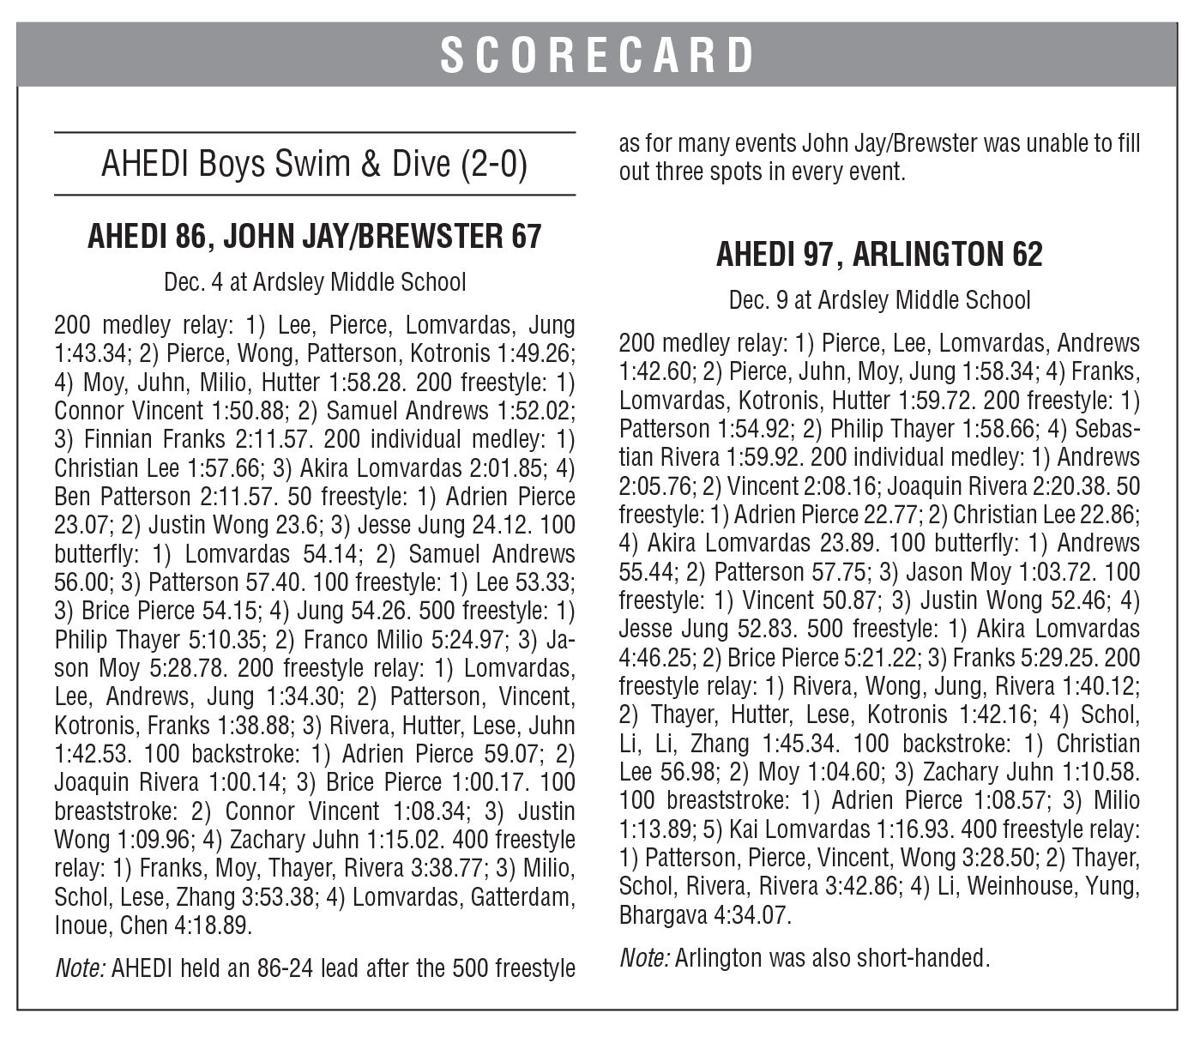 AHEDI boxscore 12/13 issue